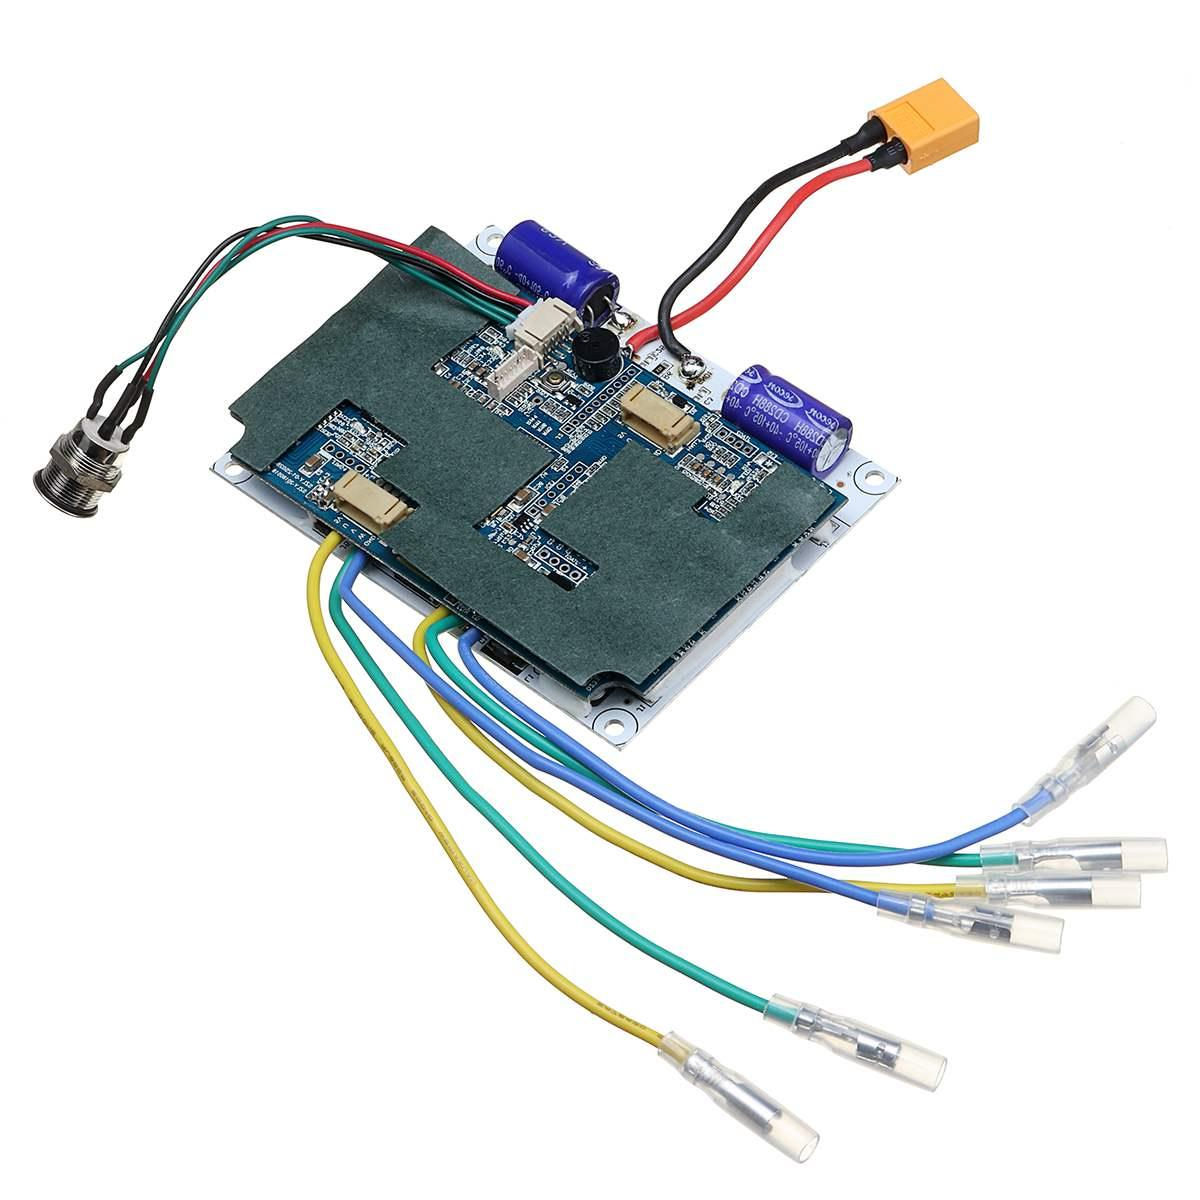 36V Skateboard ESC motor Remote Accessories